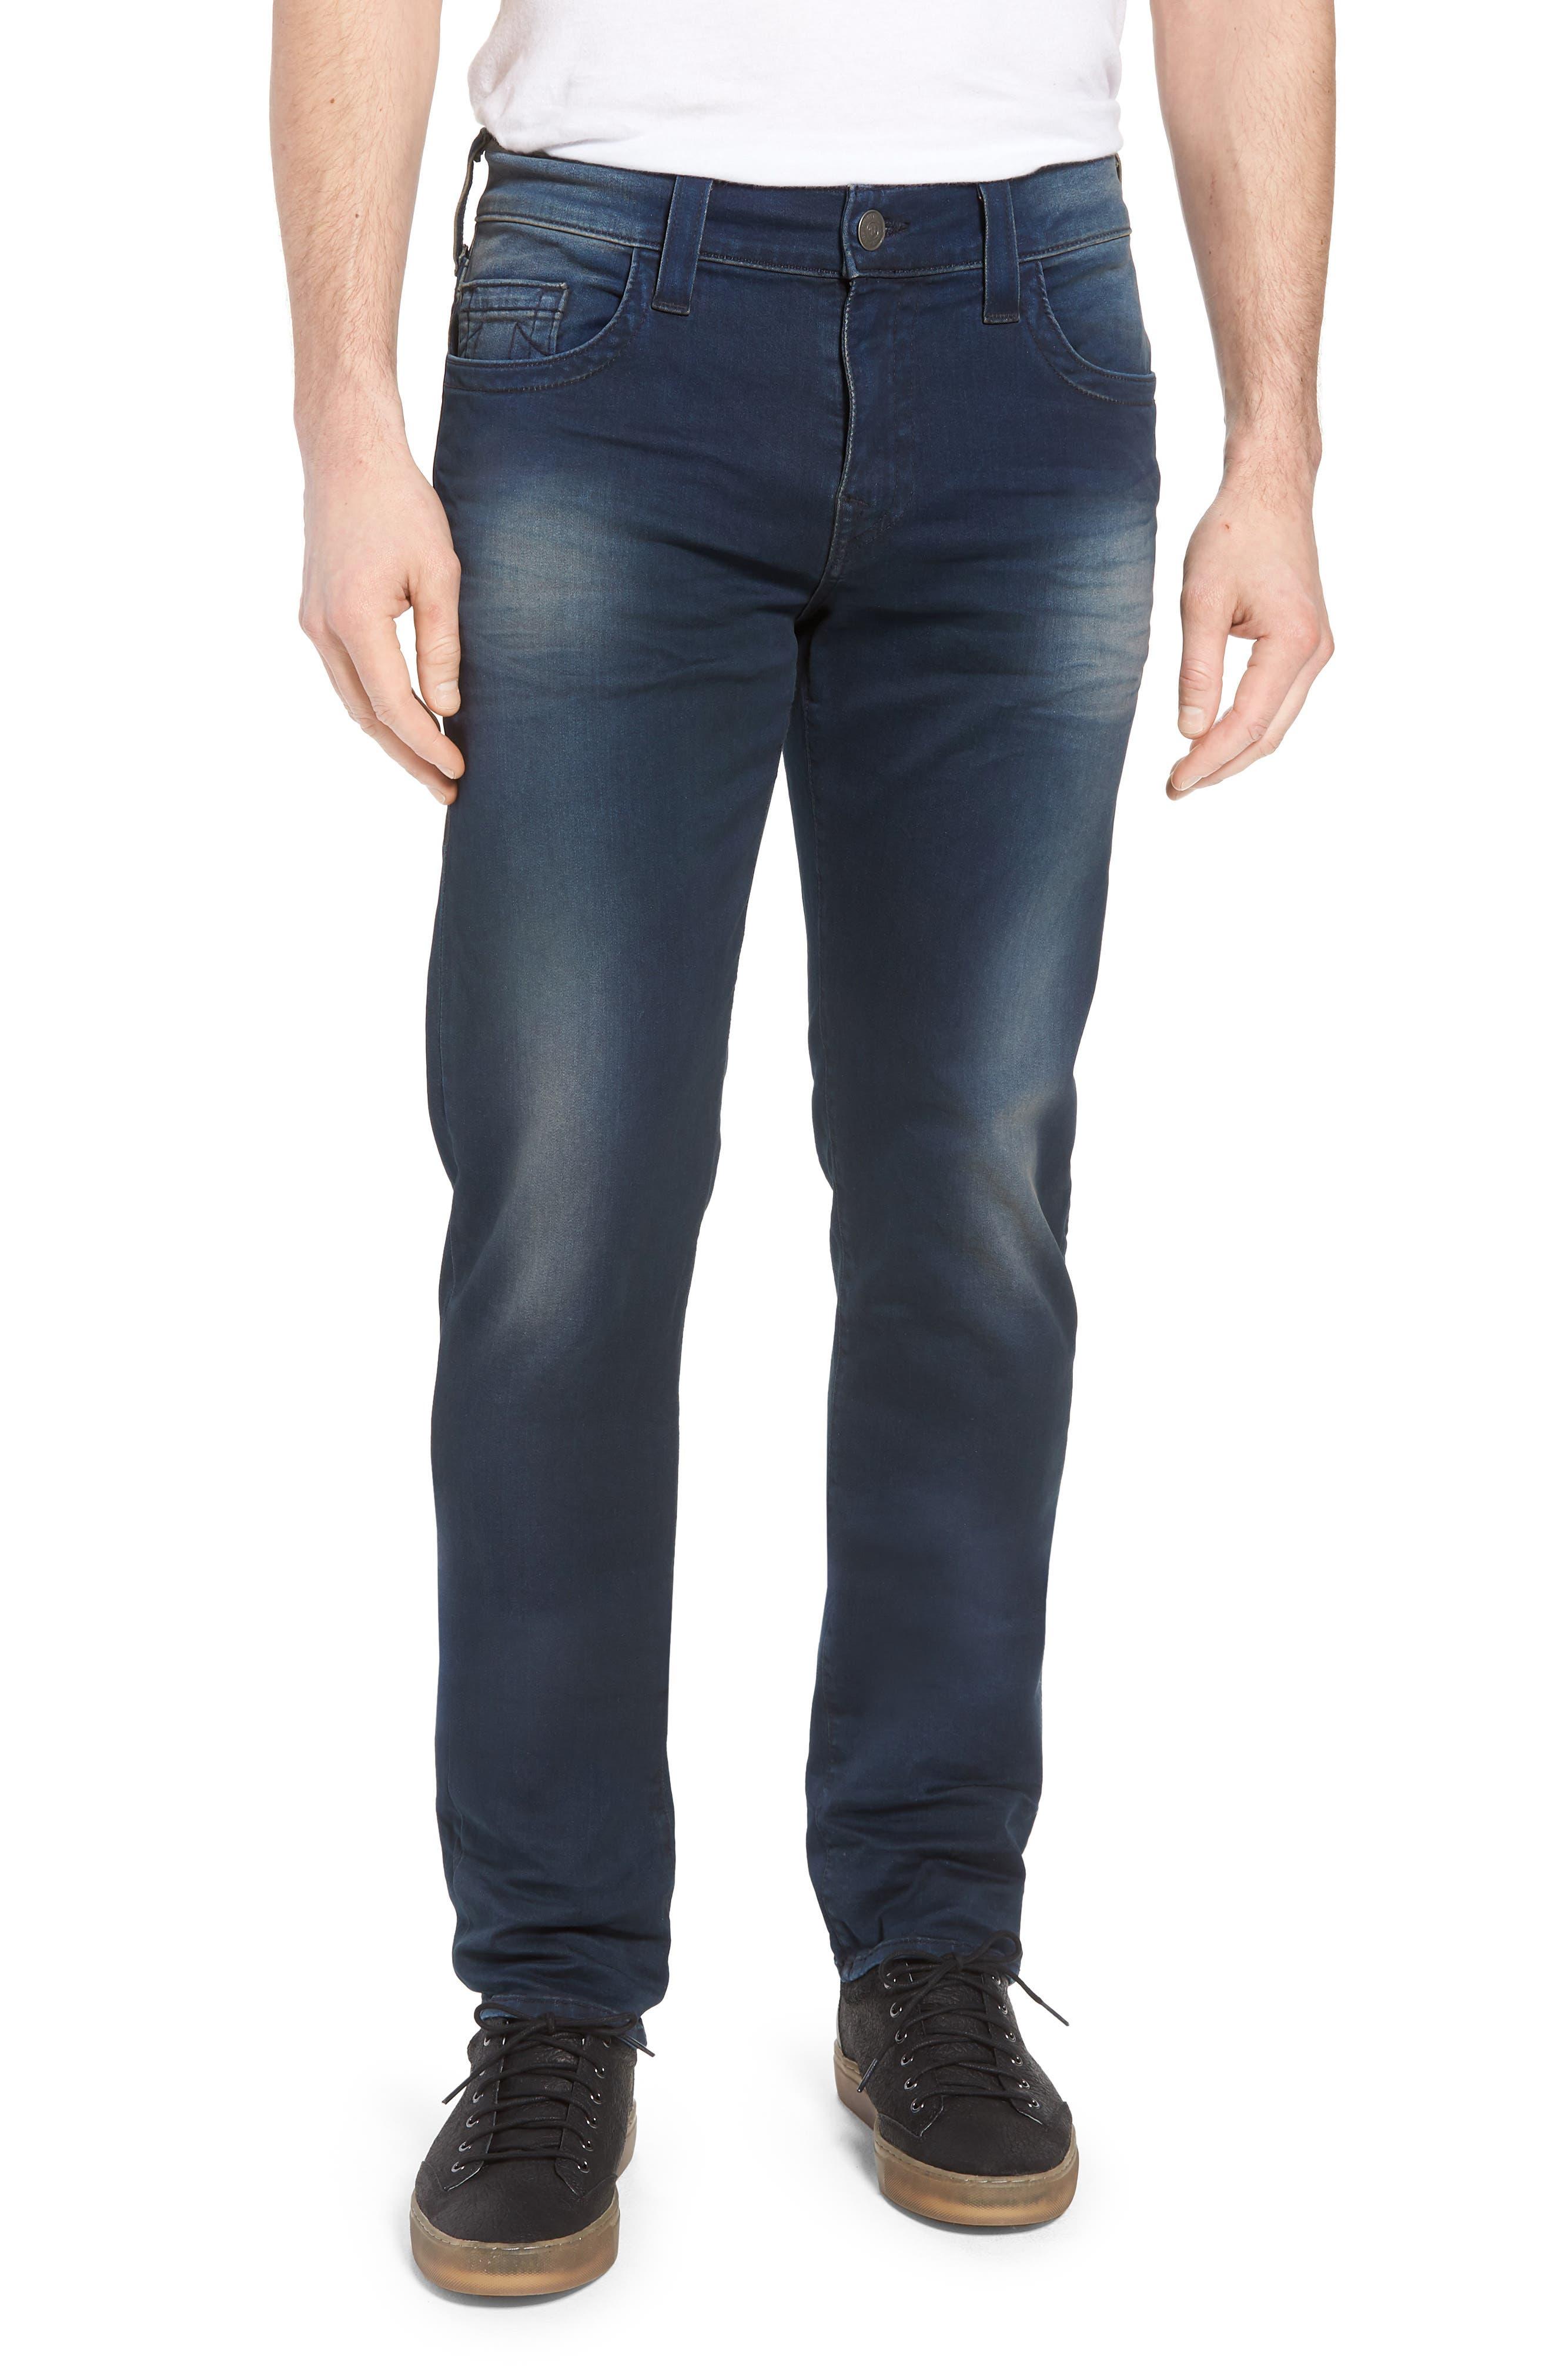 Geno Straight Leg Jeans,                             Main thumbnail 1, color,                             Dark Navy